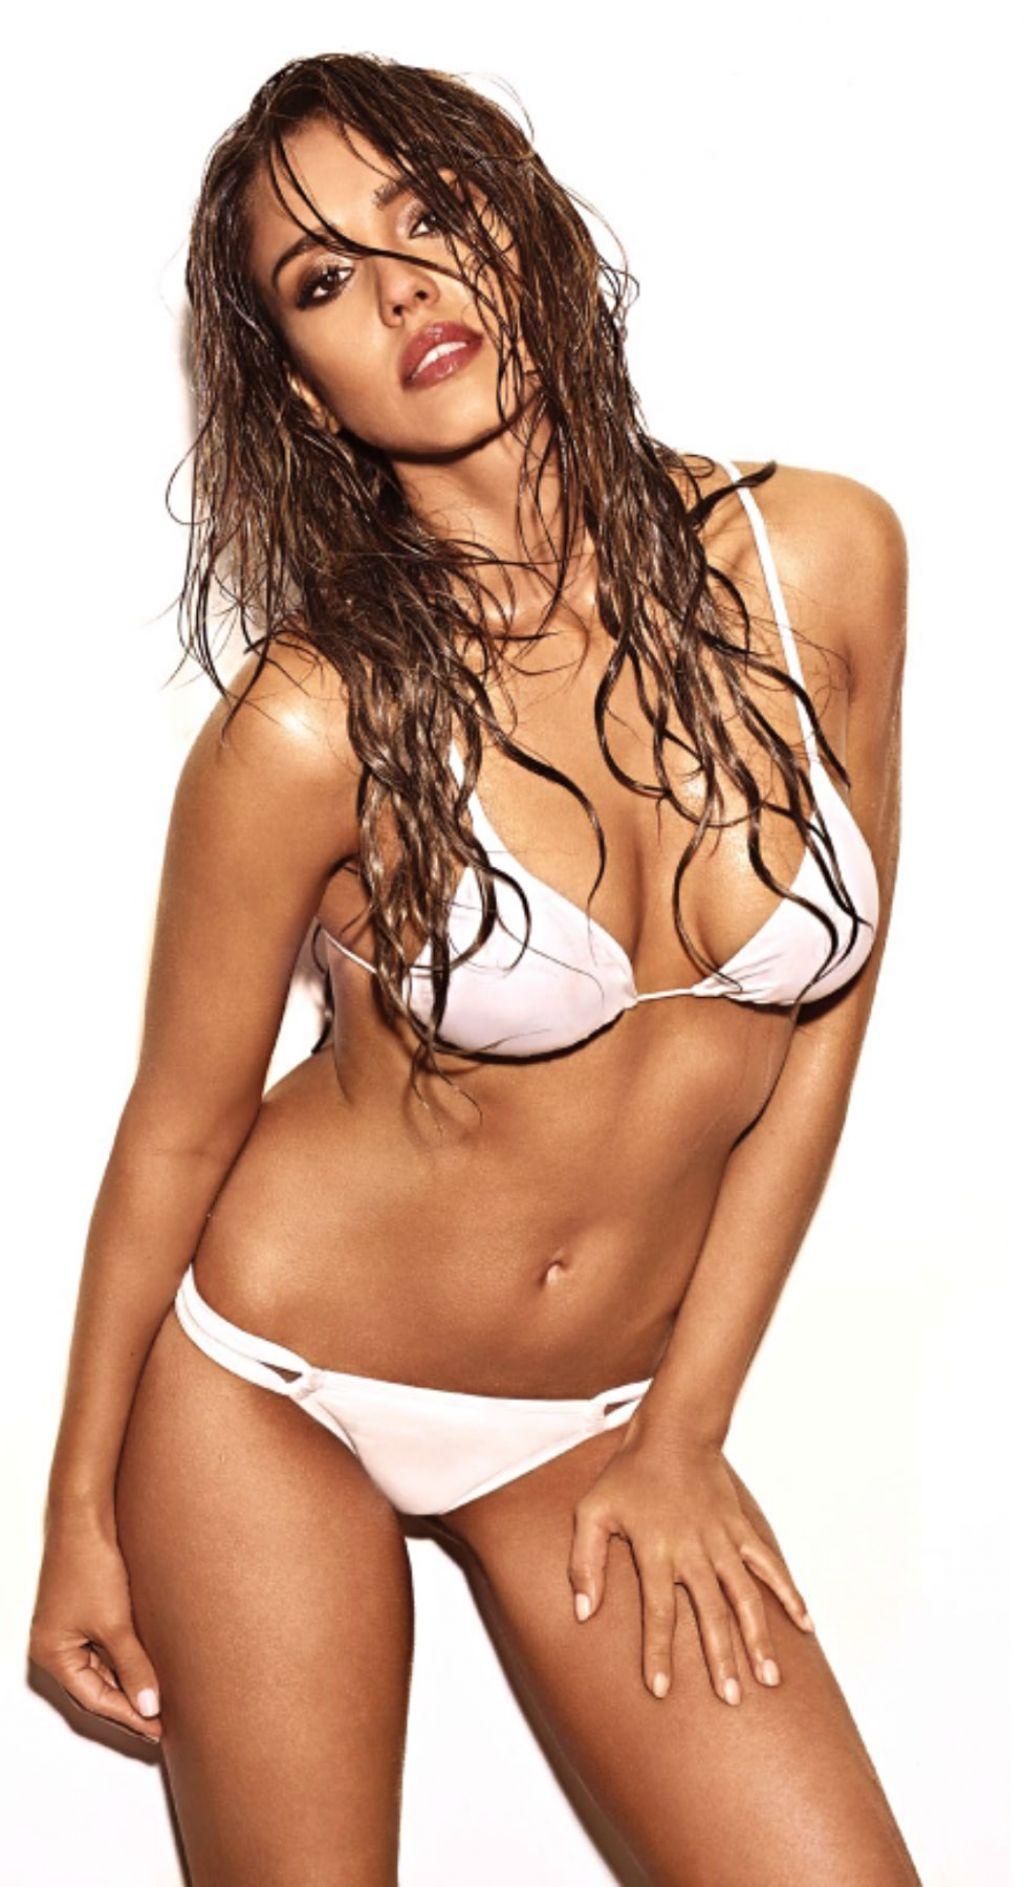 Bikini Jessica Ann nudes (79 photos), Sexy, Leaked, Instagram, butt 2018